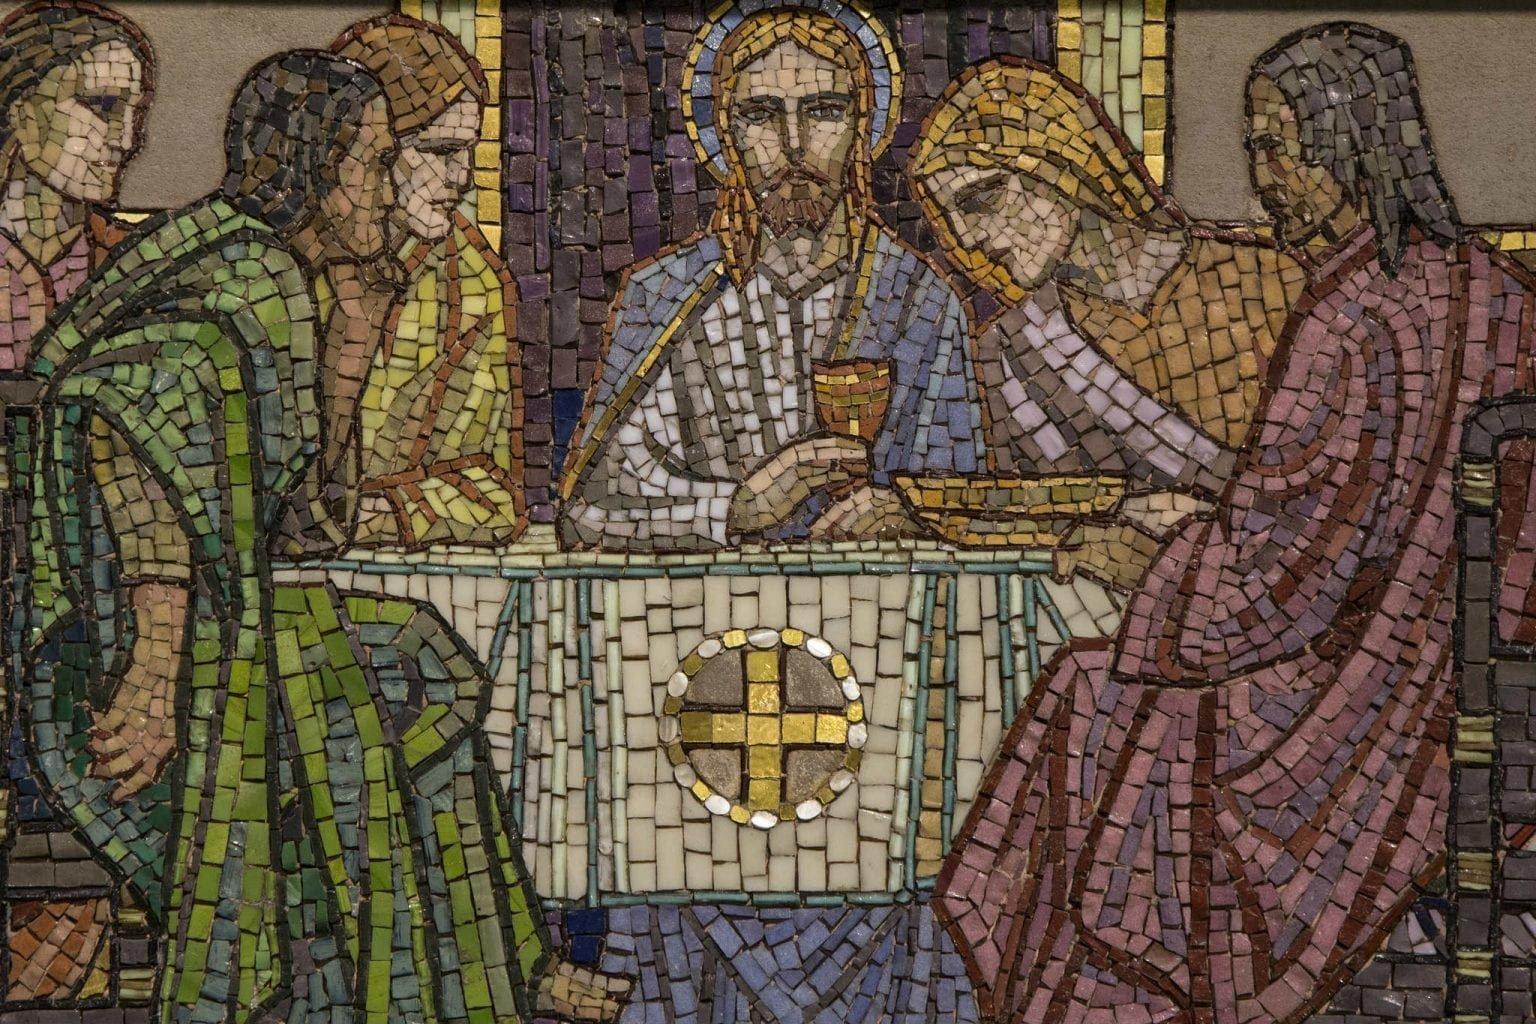 Eucharist mosaic last supper